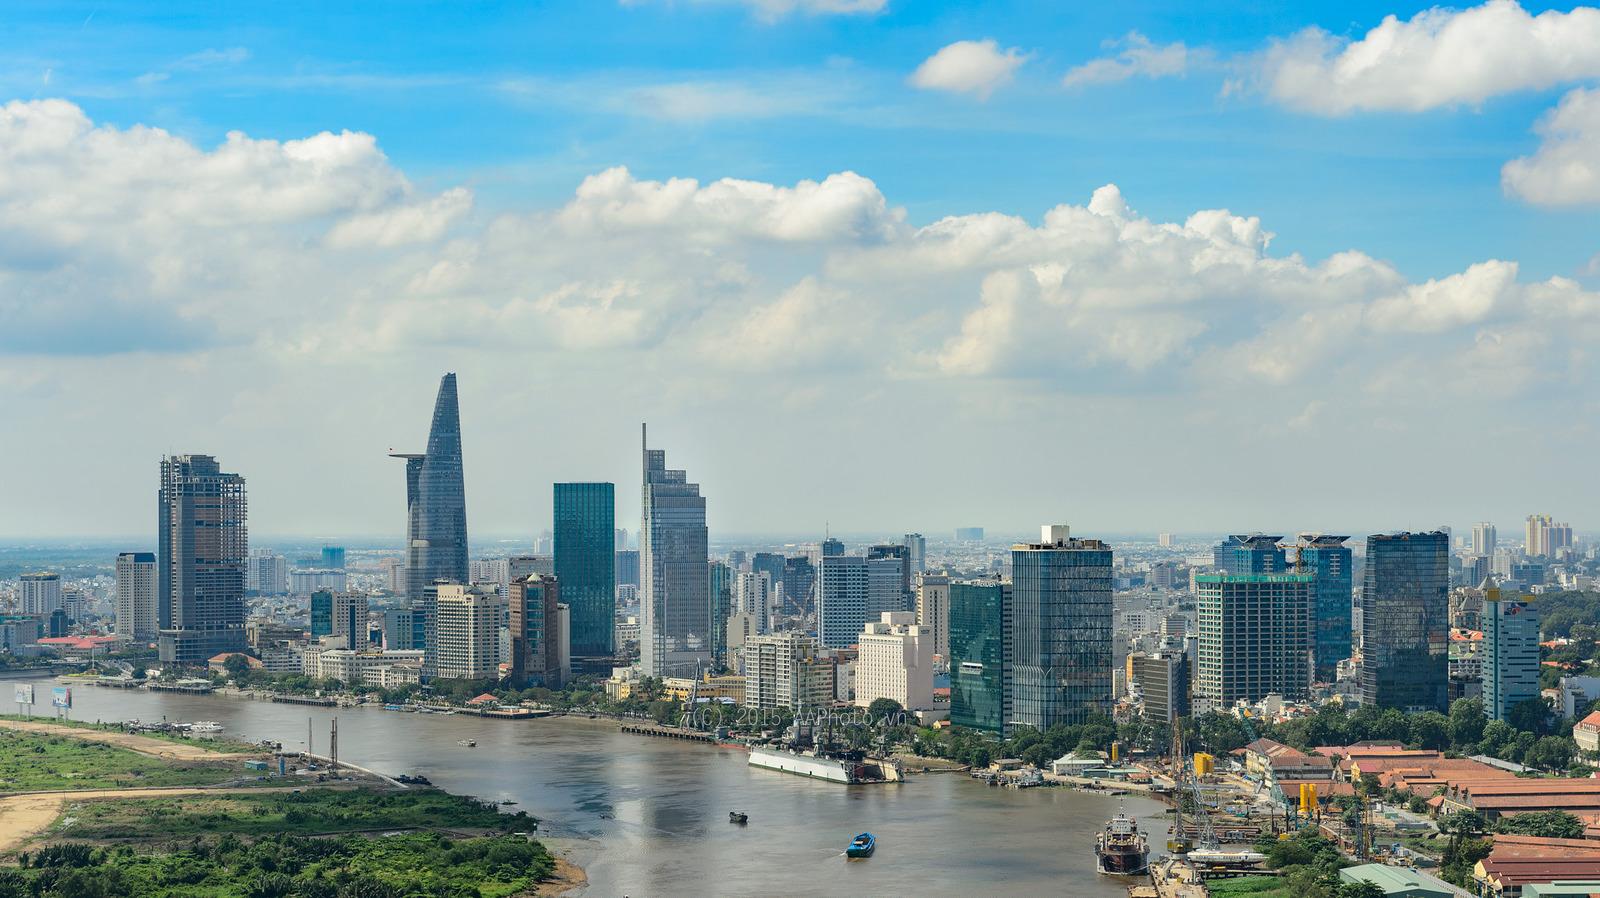 Image: Ho Chi Minh City, Vietnam;  Hieucd , Wikimedia Commons; CC BY-SA 4.0 International